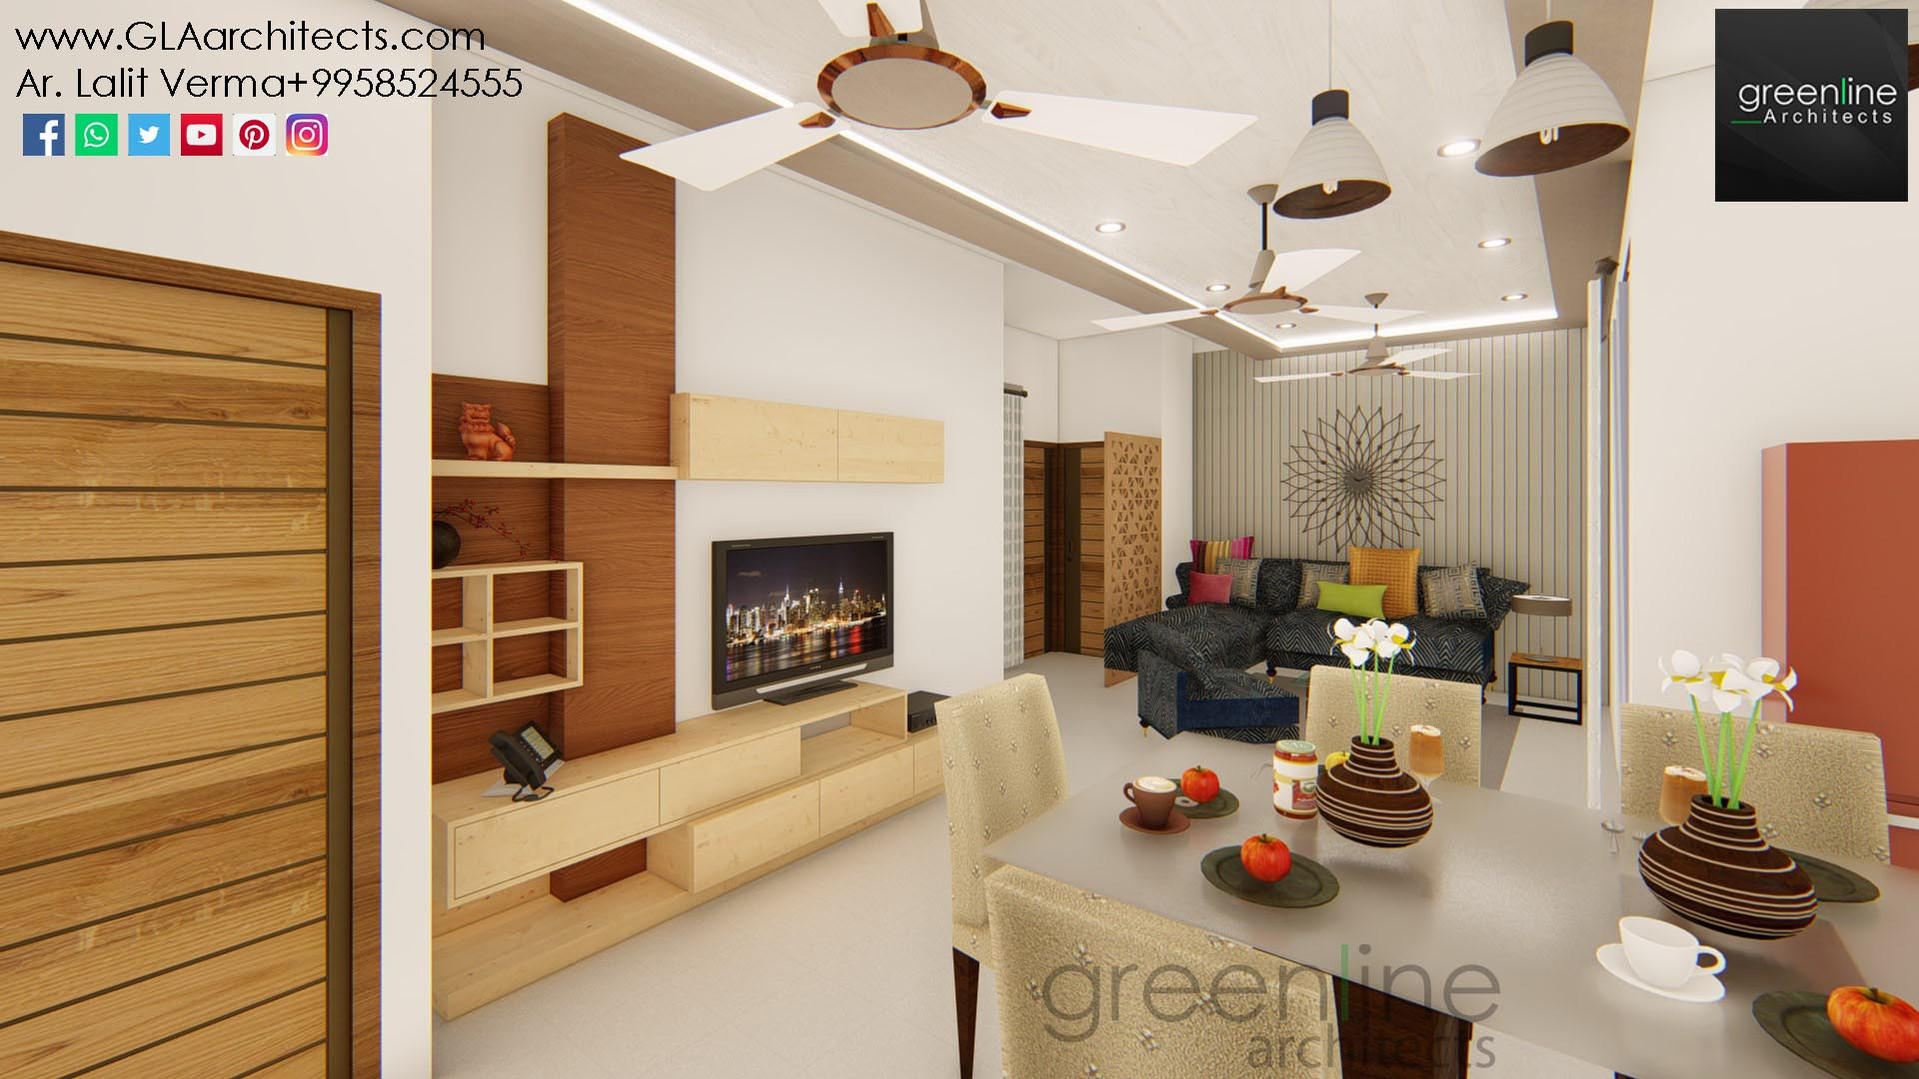 3 BHK-Apartment_Home Interior (6).jpg